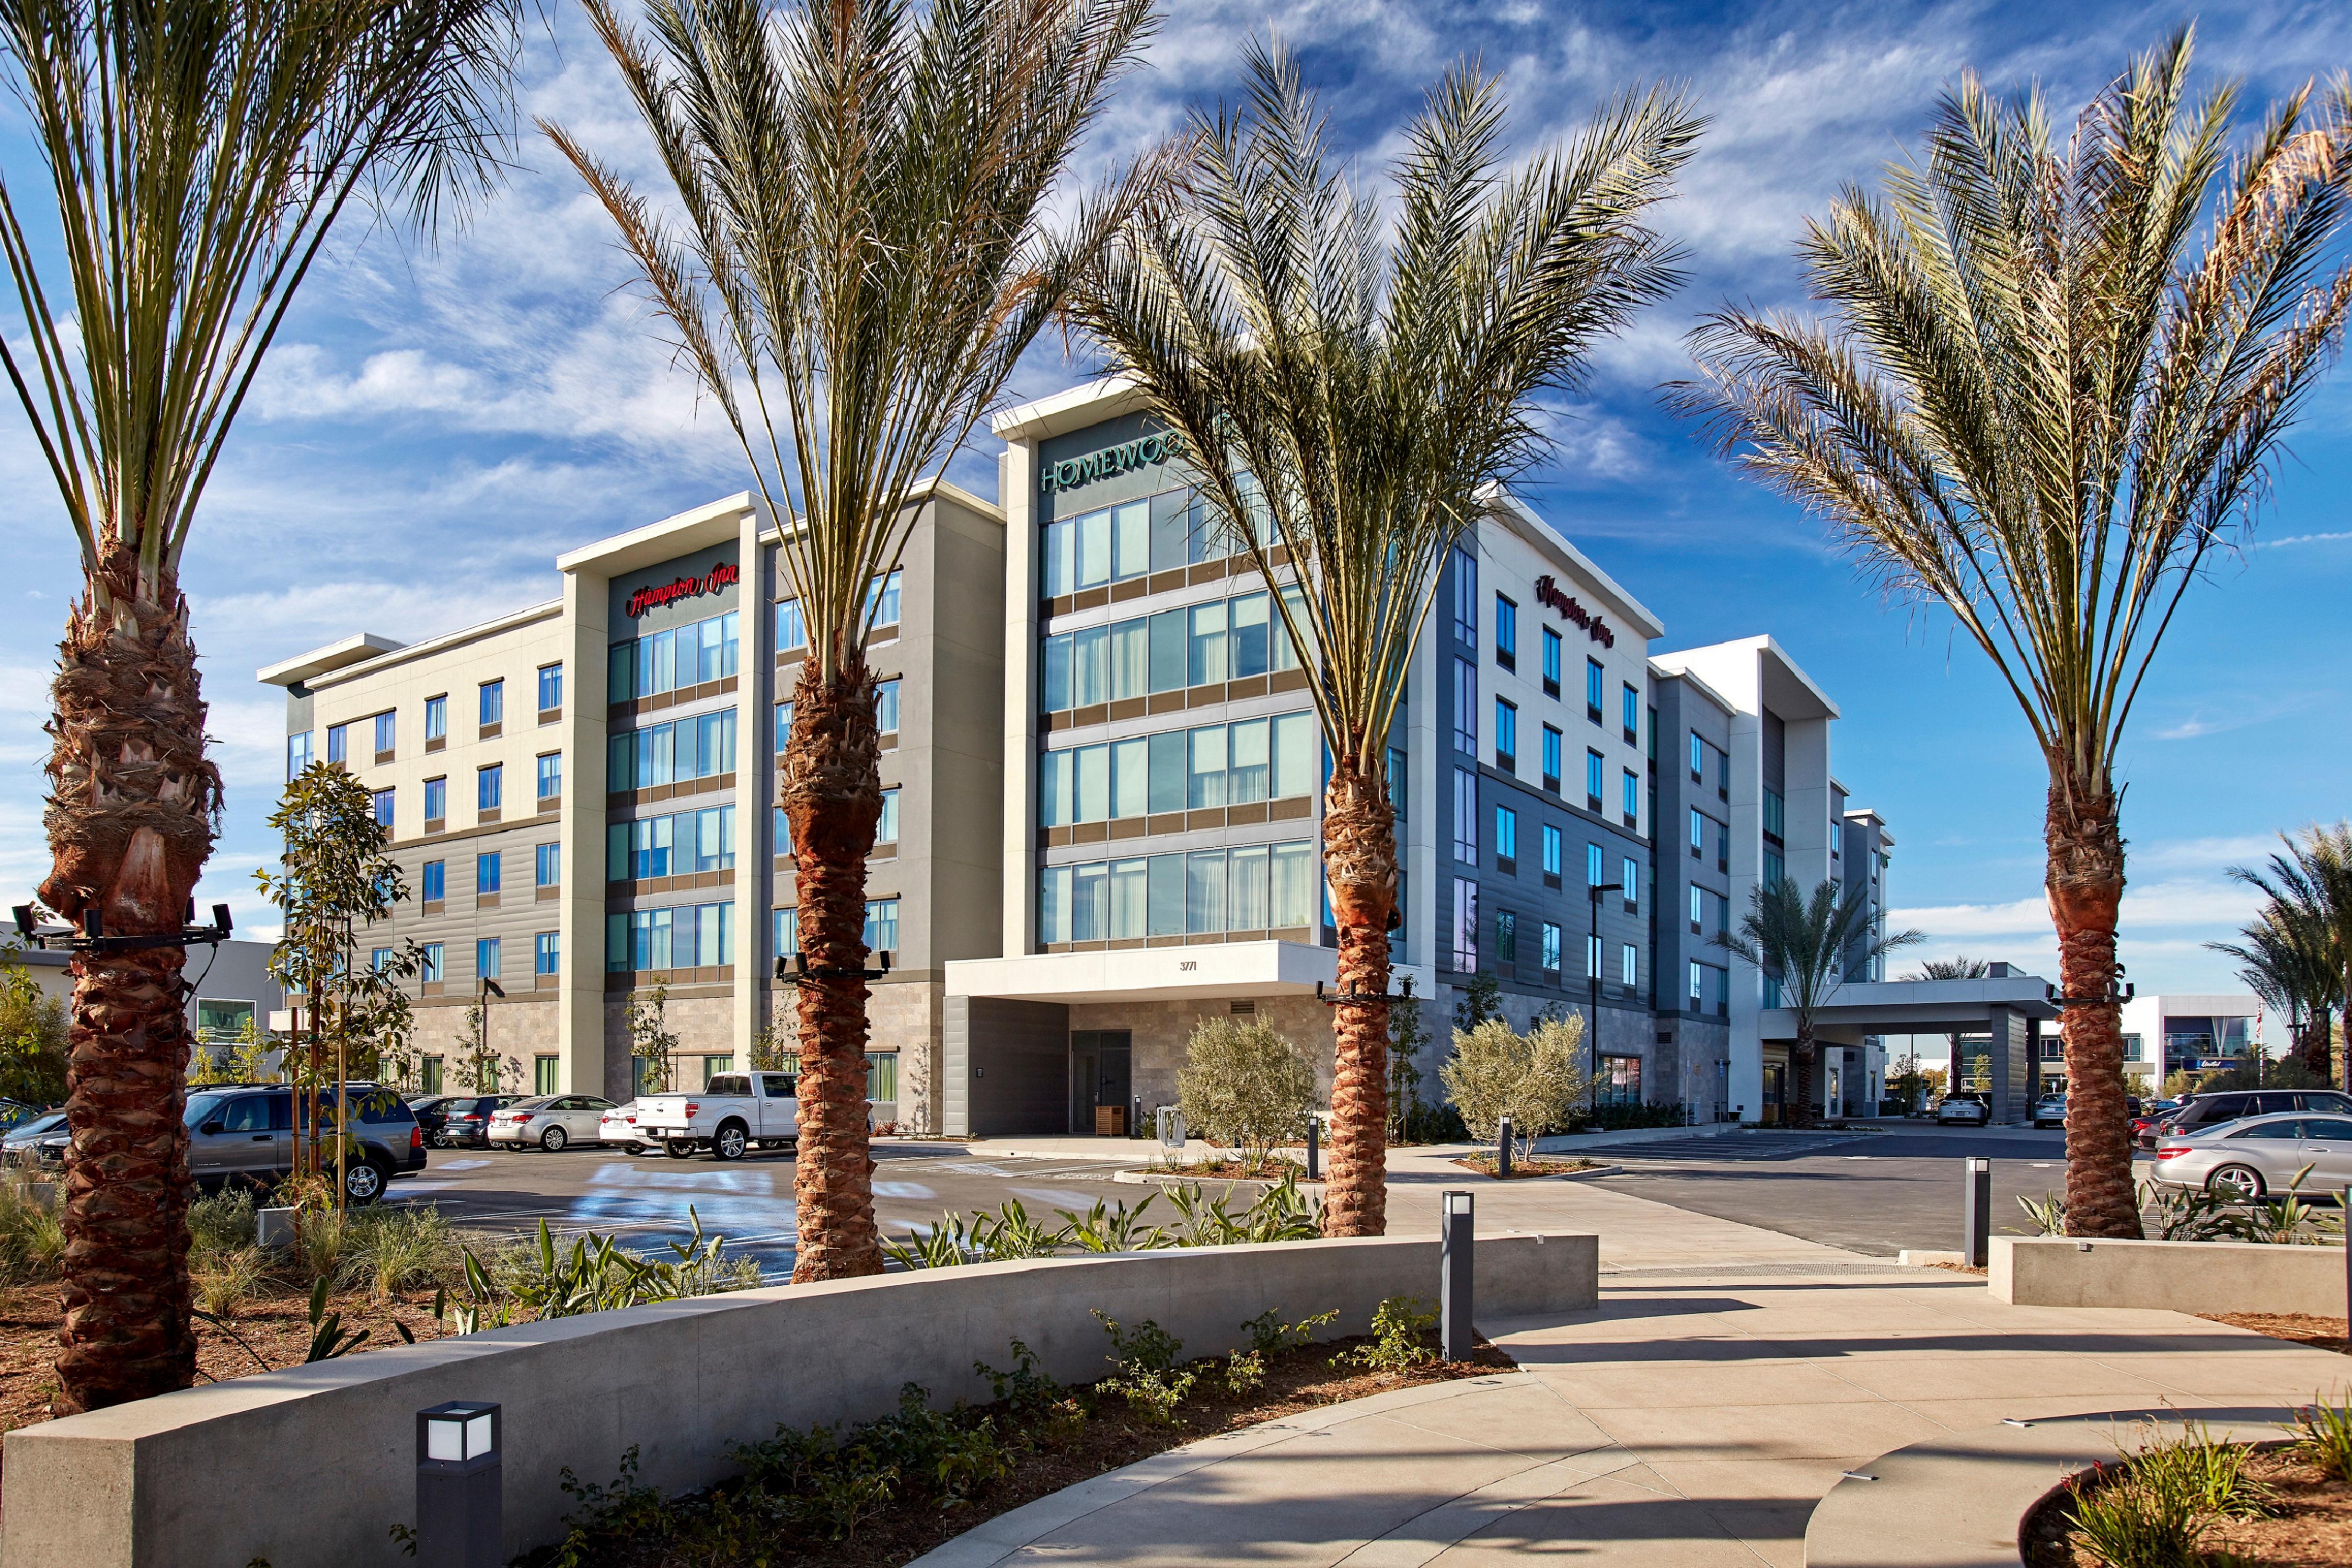 Long Beach Airport Car Rental Hours